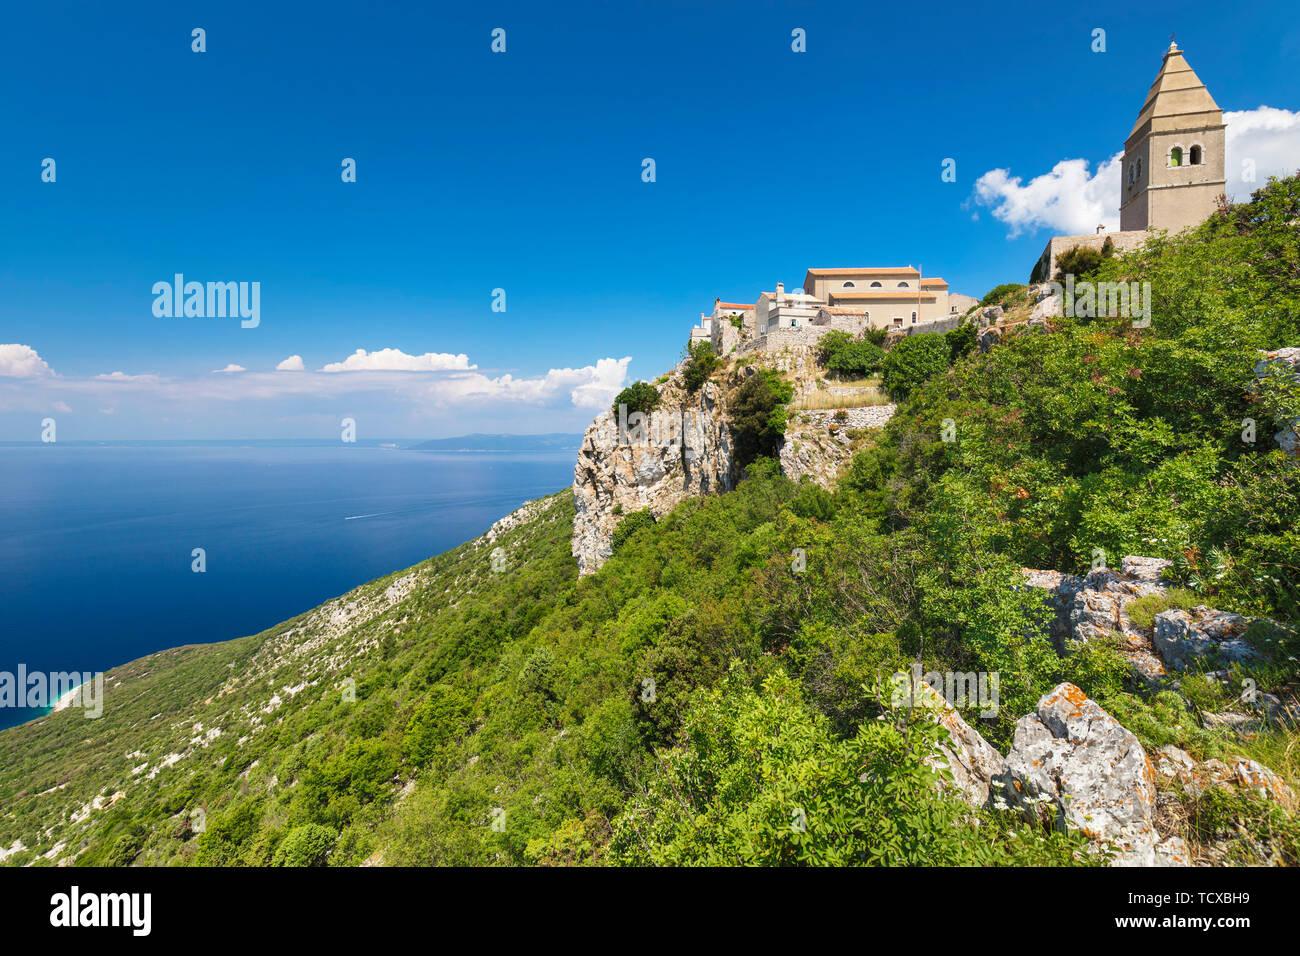 Lubenice, Cres Island, Kvarner Gulf, Croatia, Europe Stock Photo